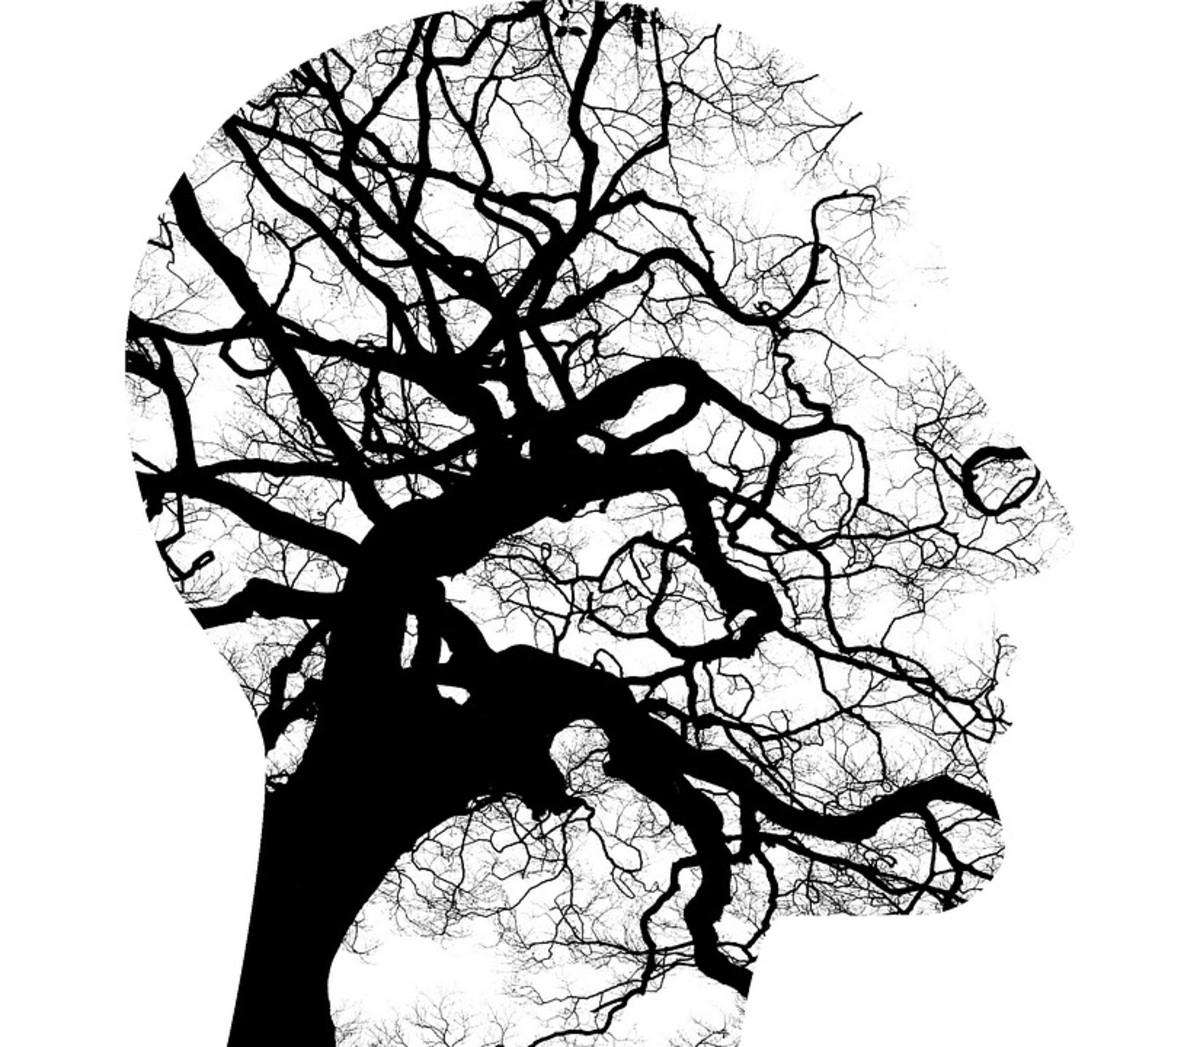 bipolar-disorder-the-x-man-illness